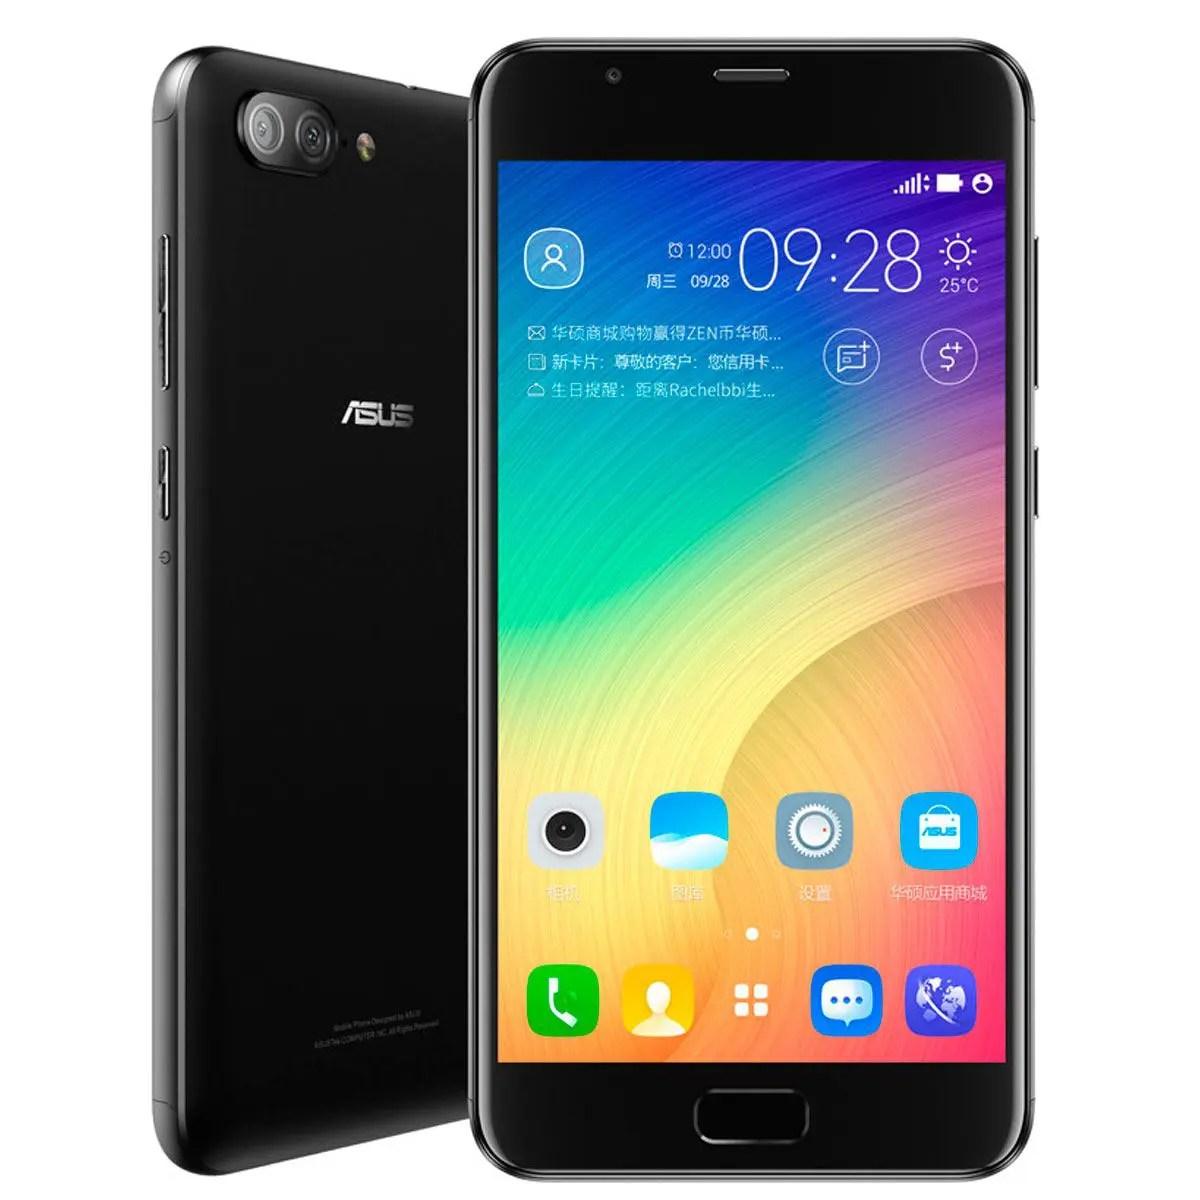 Celular Smartphone Zenfone 4 Max Dual Chip 55 Asus